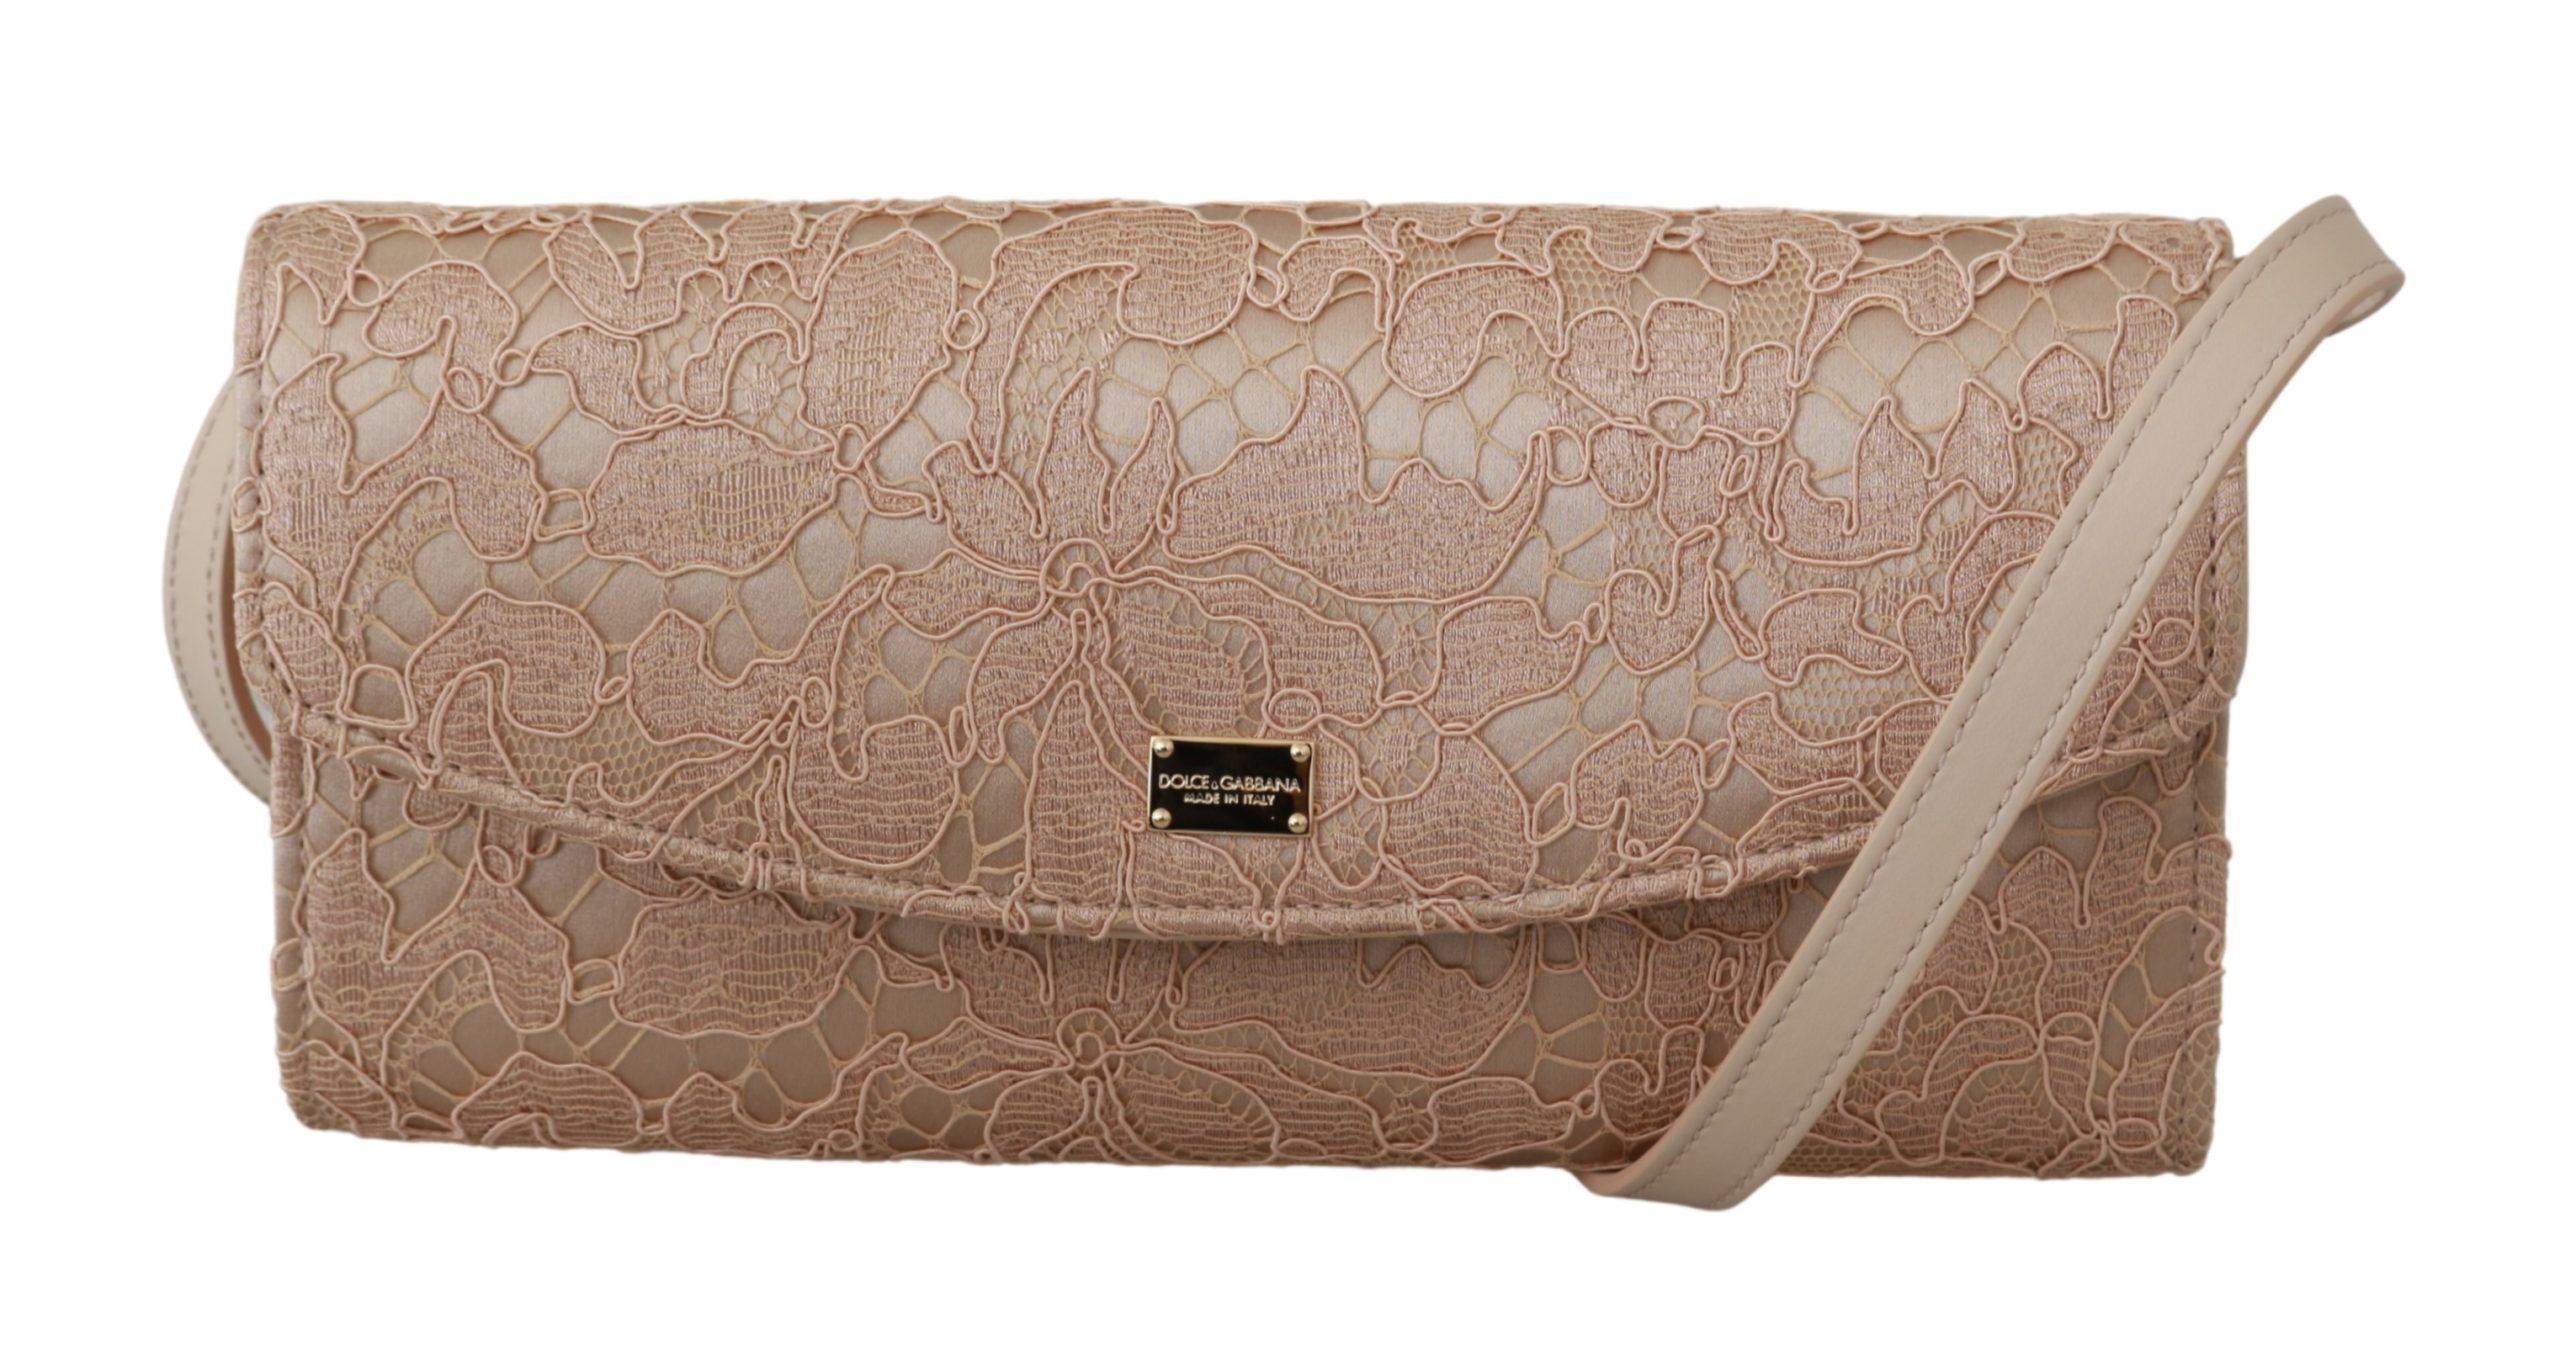 Dolce & Gabbana Women's Floral Lace Evening Long Cotton Crossbody Bag Beige VAS9209